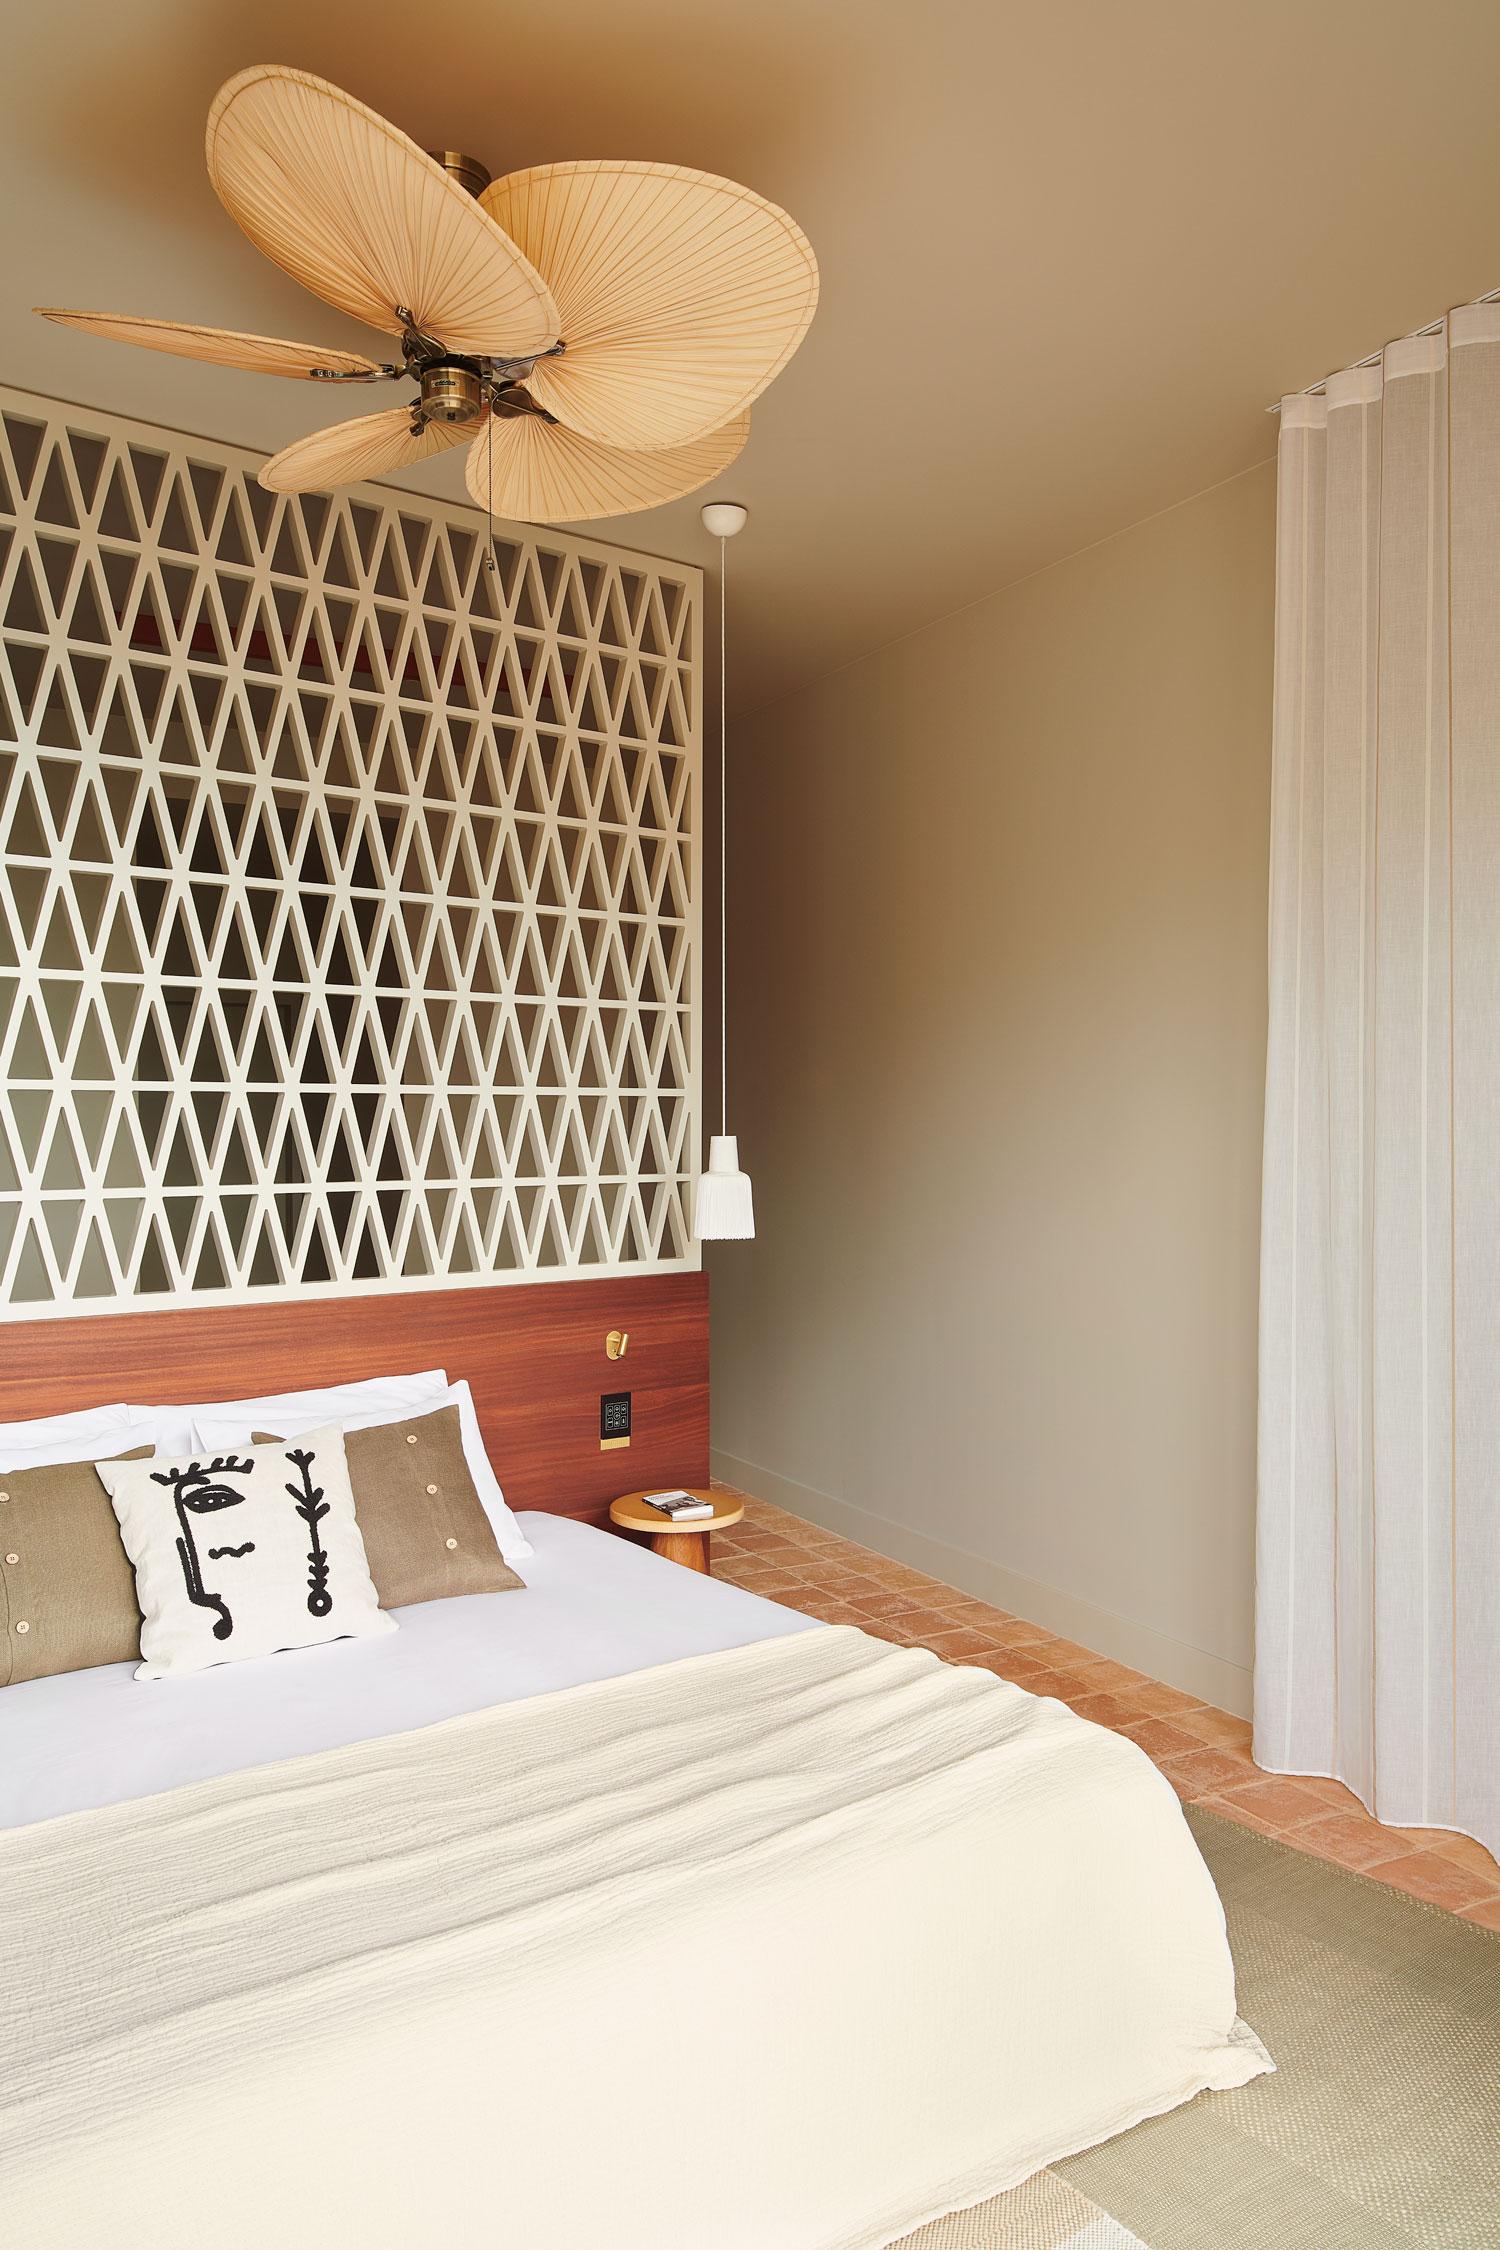 Lam Studio Hotel Maslina Hvar Croatia Luxury Accommodatino Photo Claire Israel Yellowtrace 10